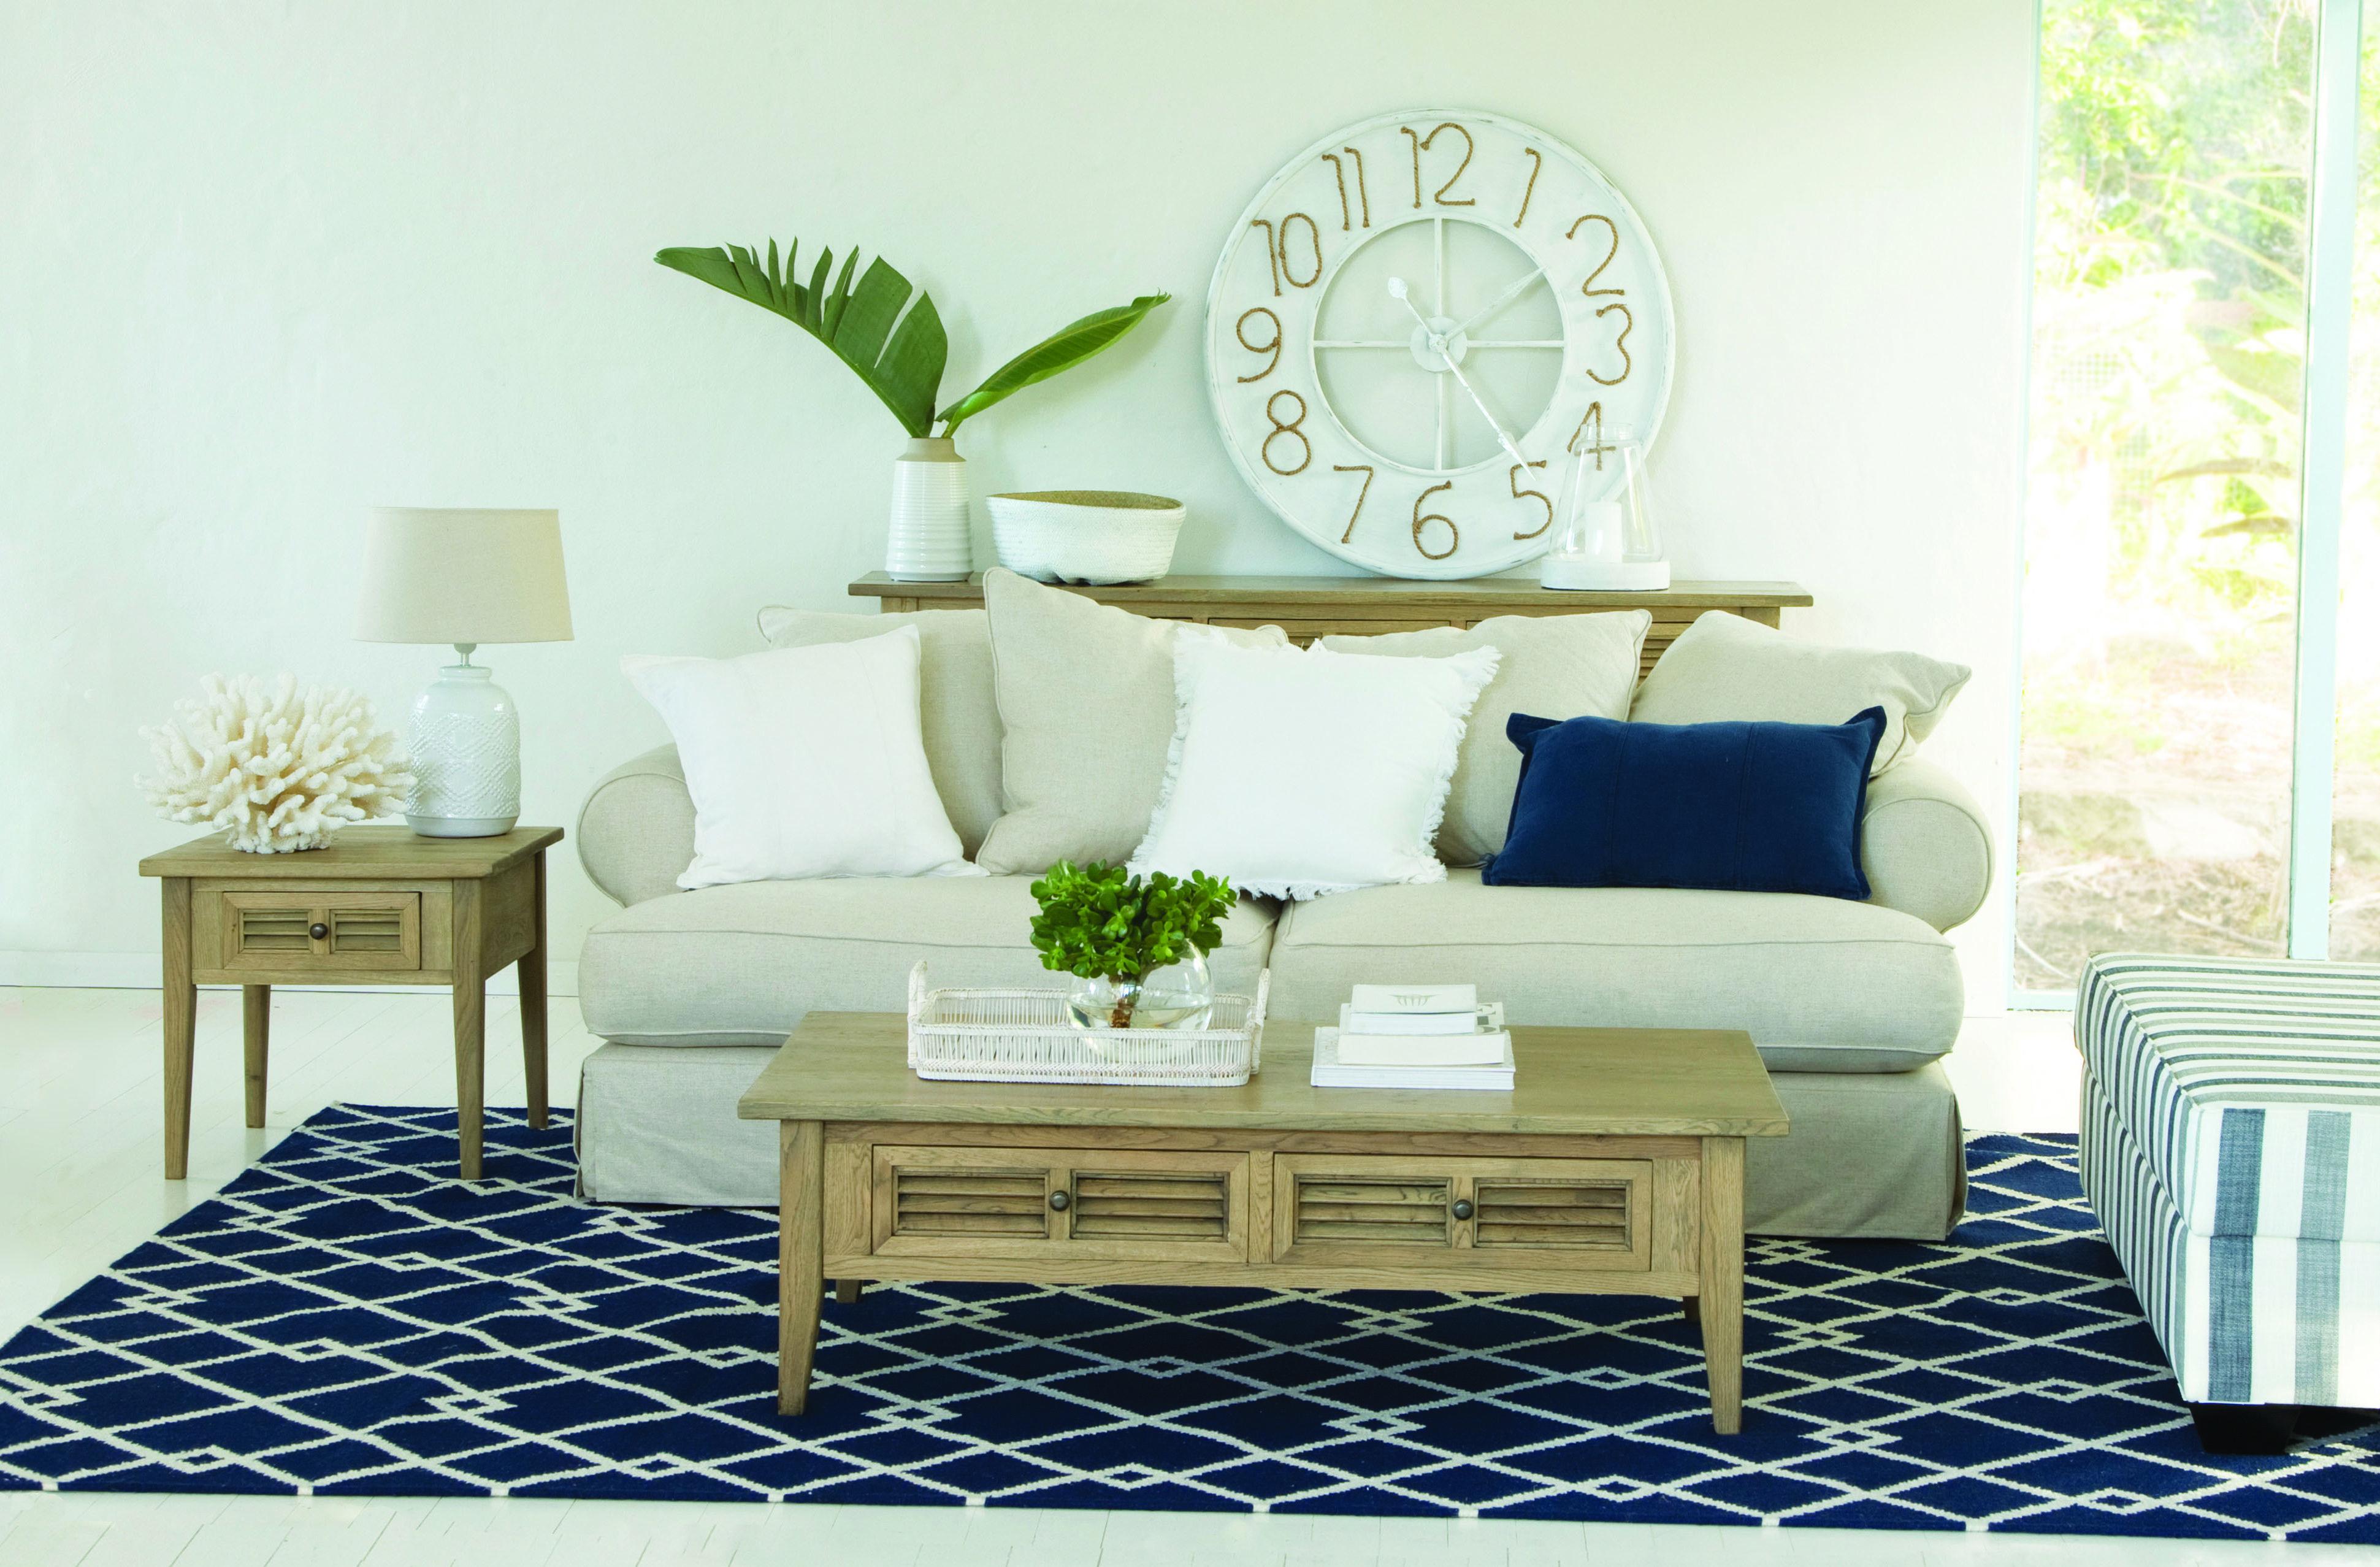 Jarvis Chair Oz Design Rocking Pad Beach Living Colour Scheme Furniture